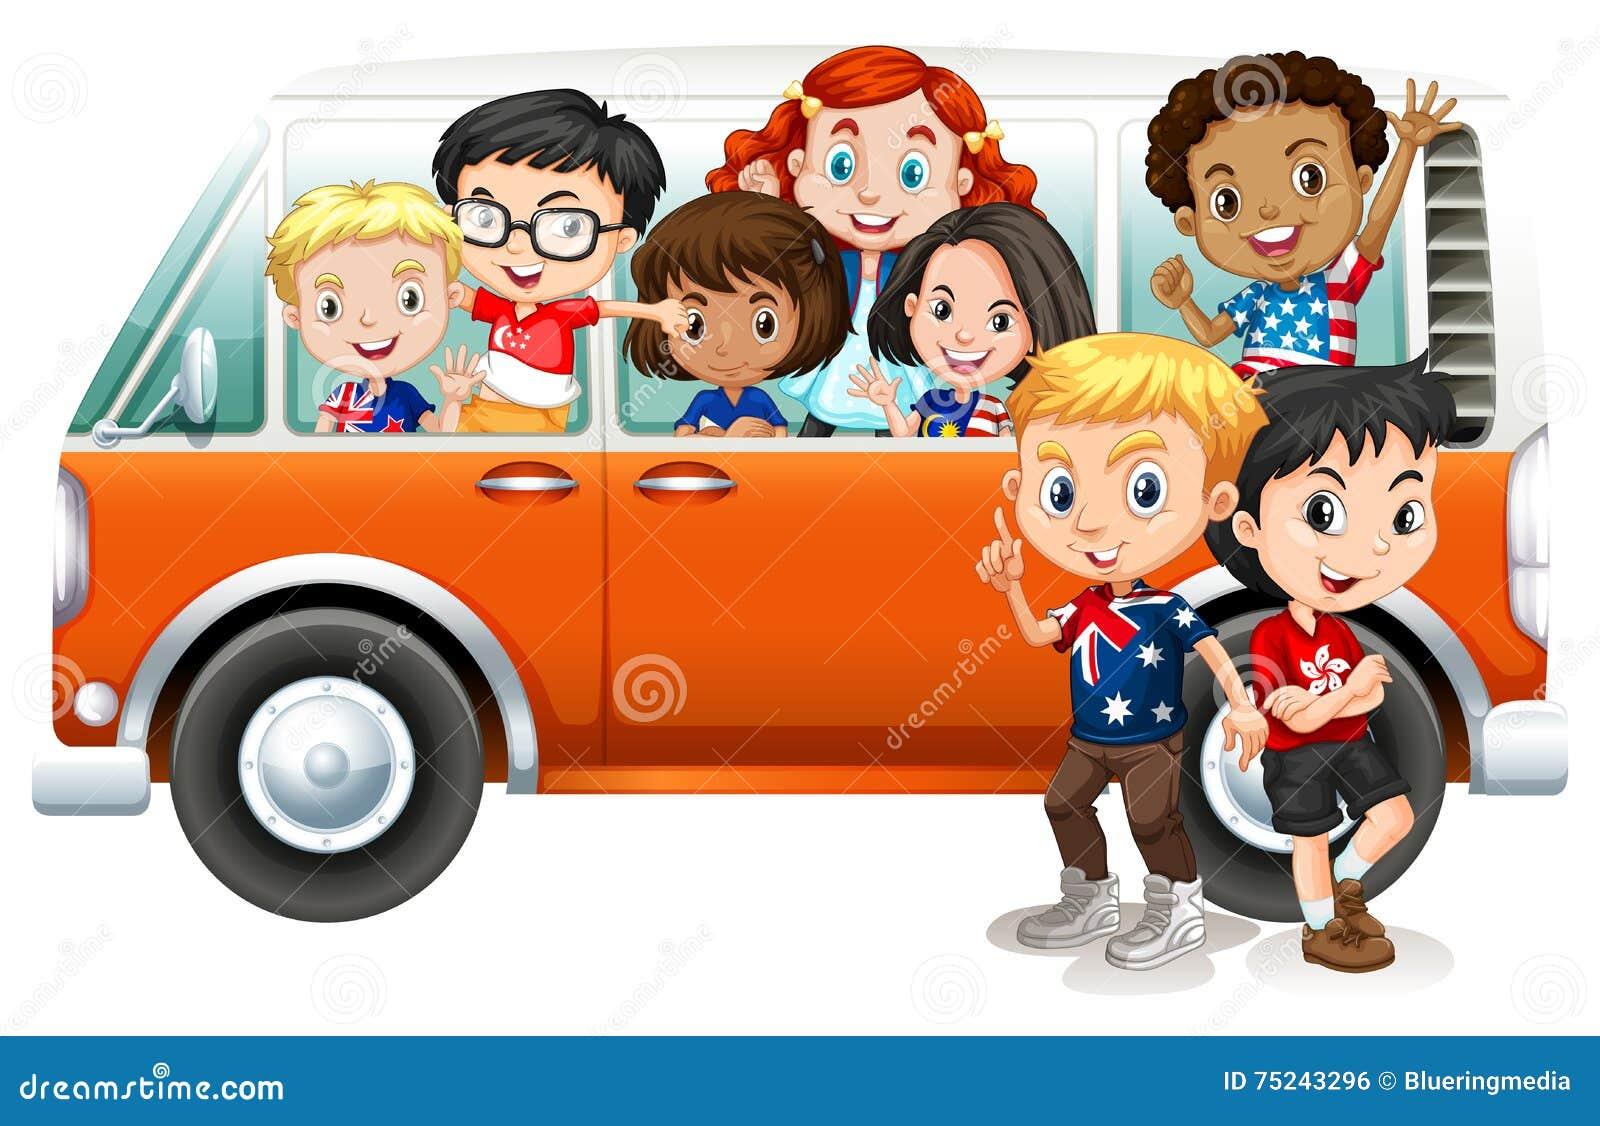 b6106df7b9 Buy kids van   OFF78% Discounts